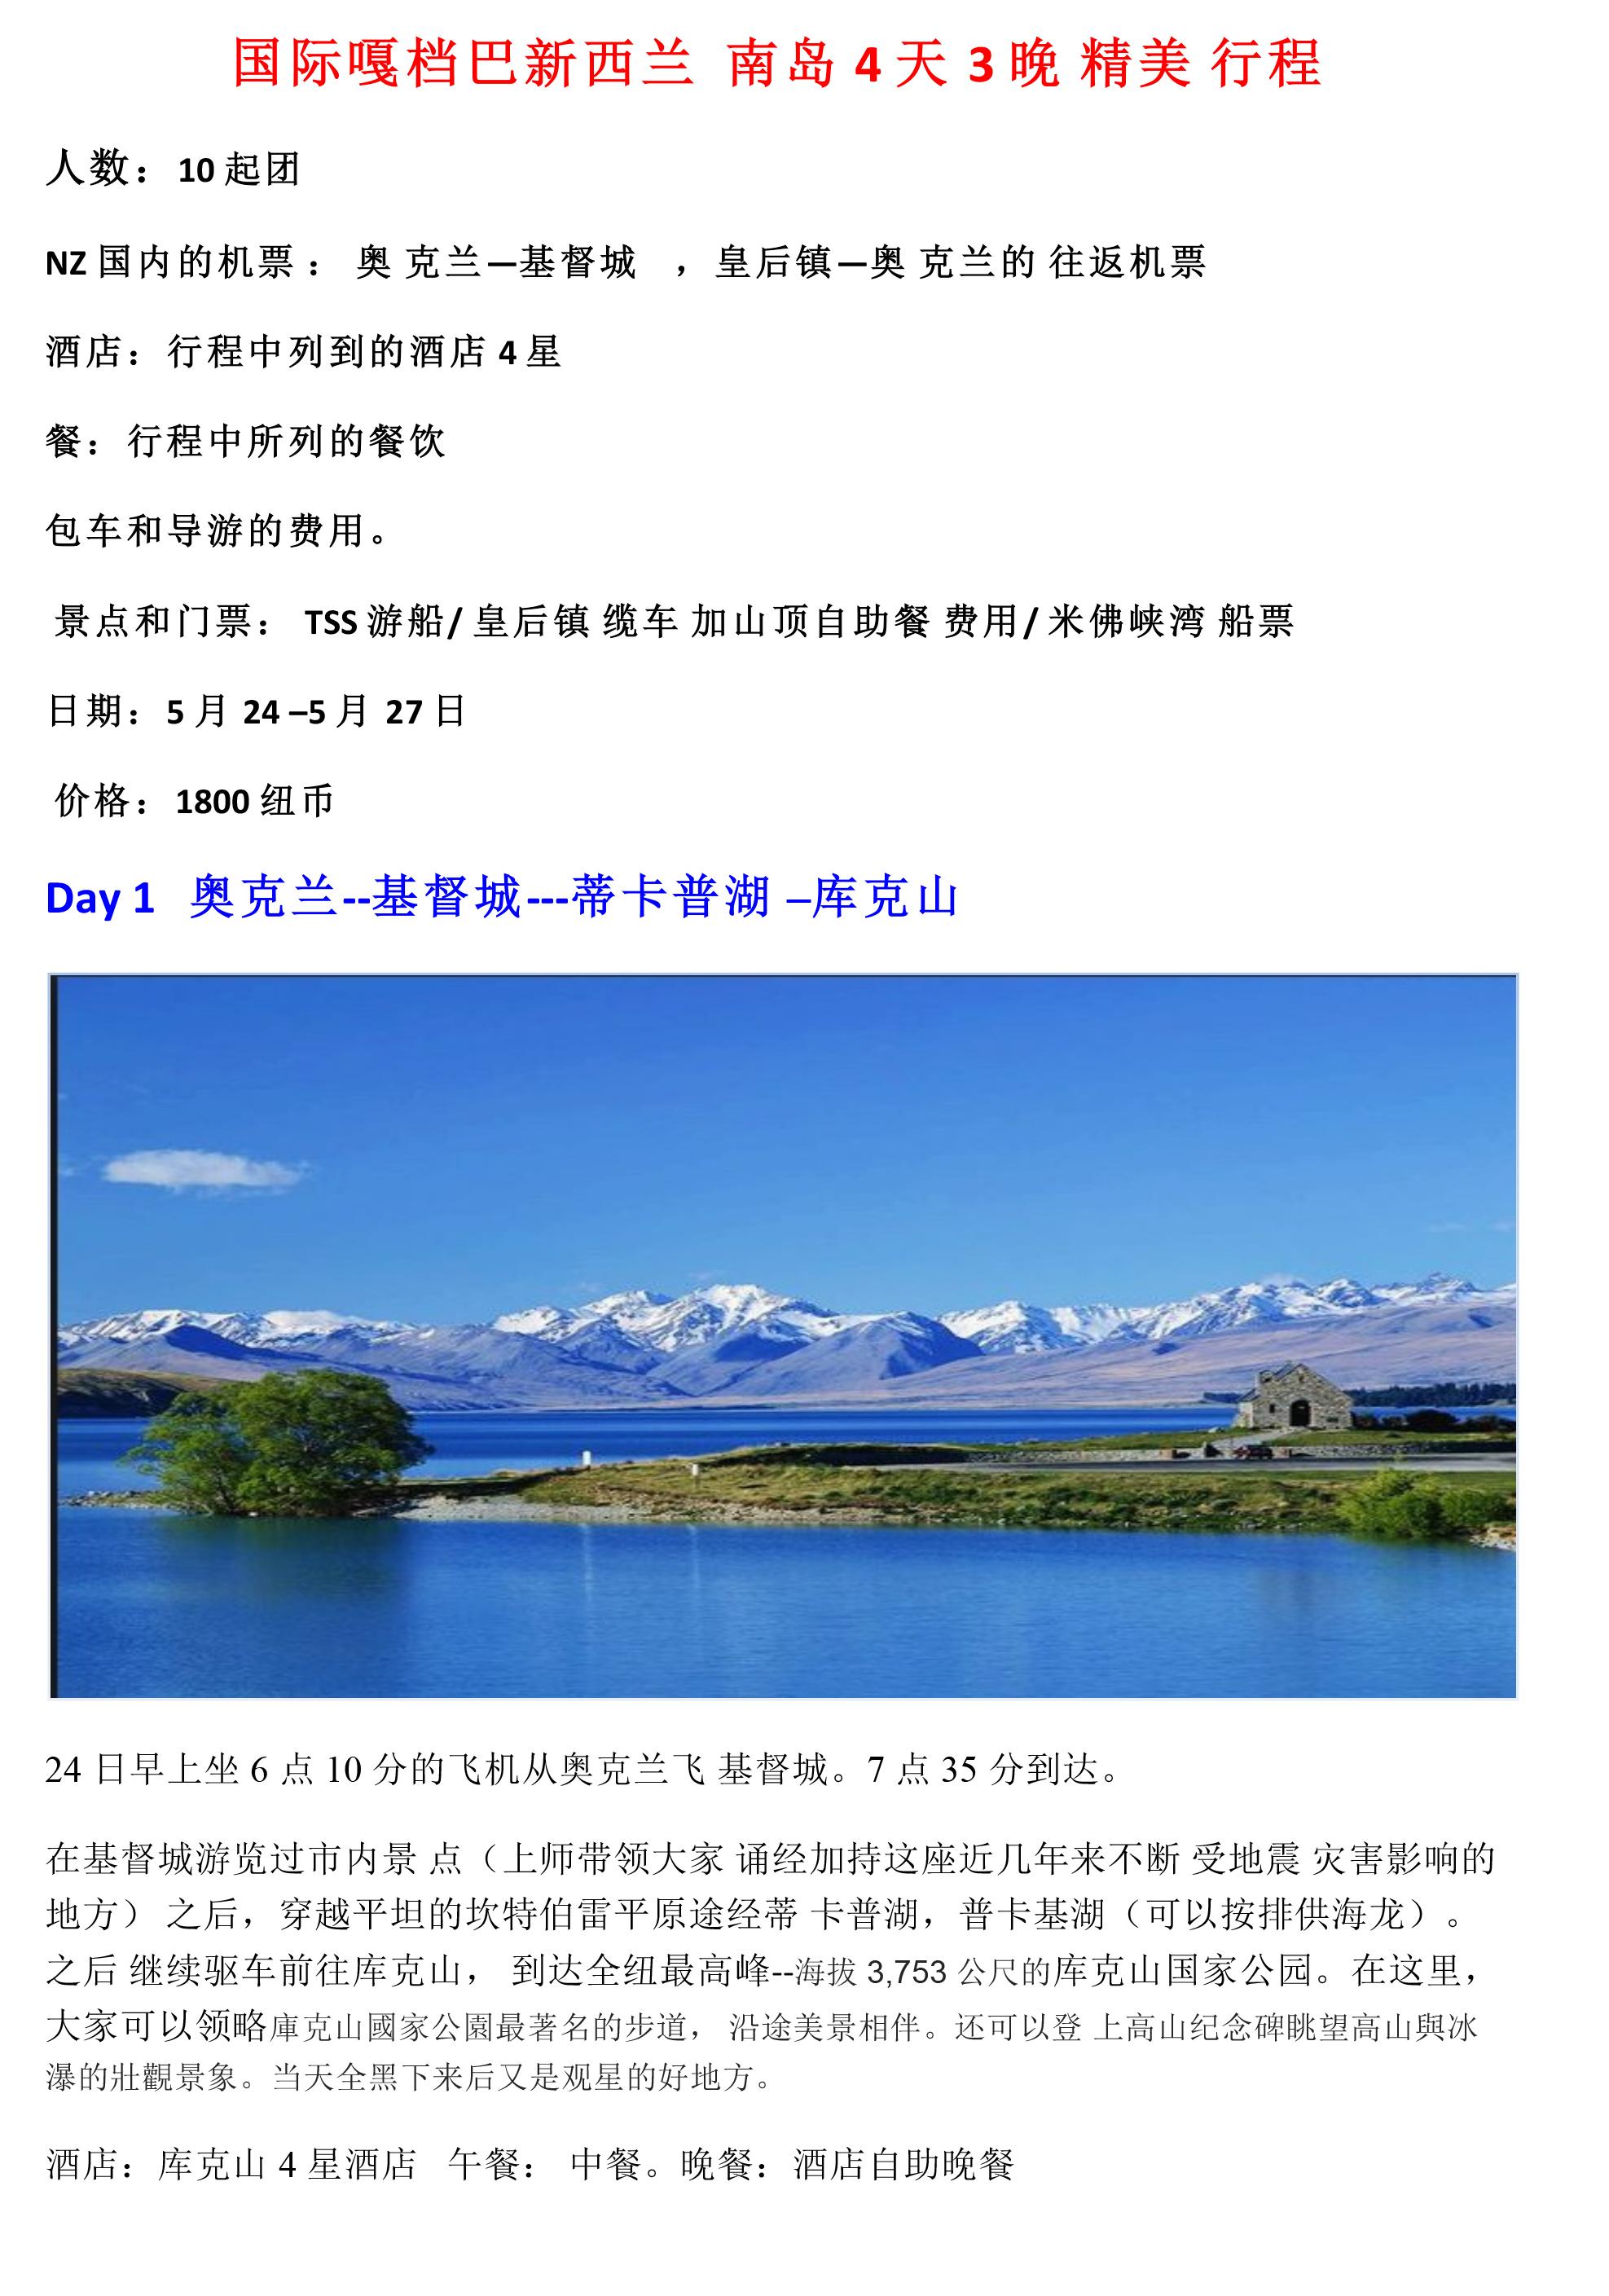 Microsoft Word - 国际嘎档巴新西兰南岛4天3晚精华之